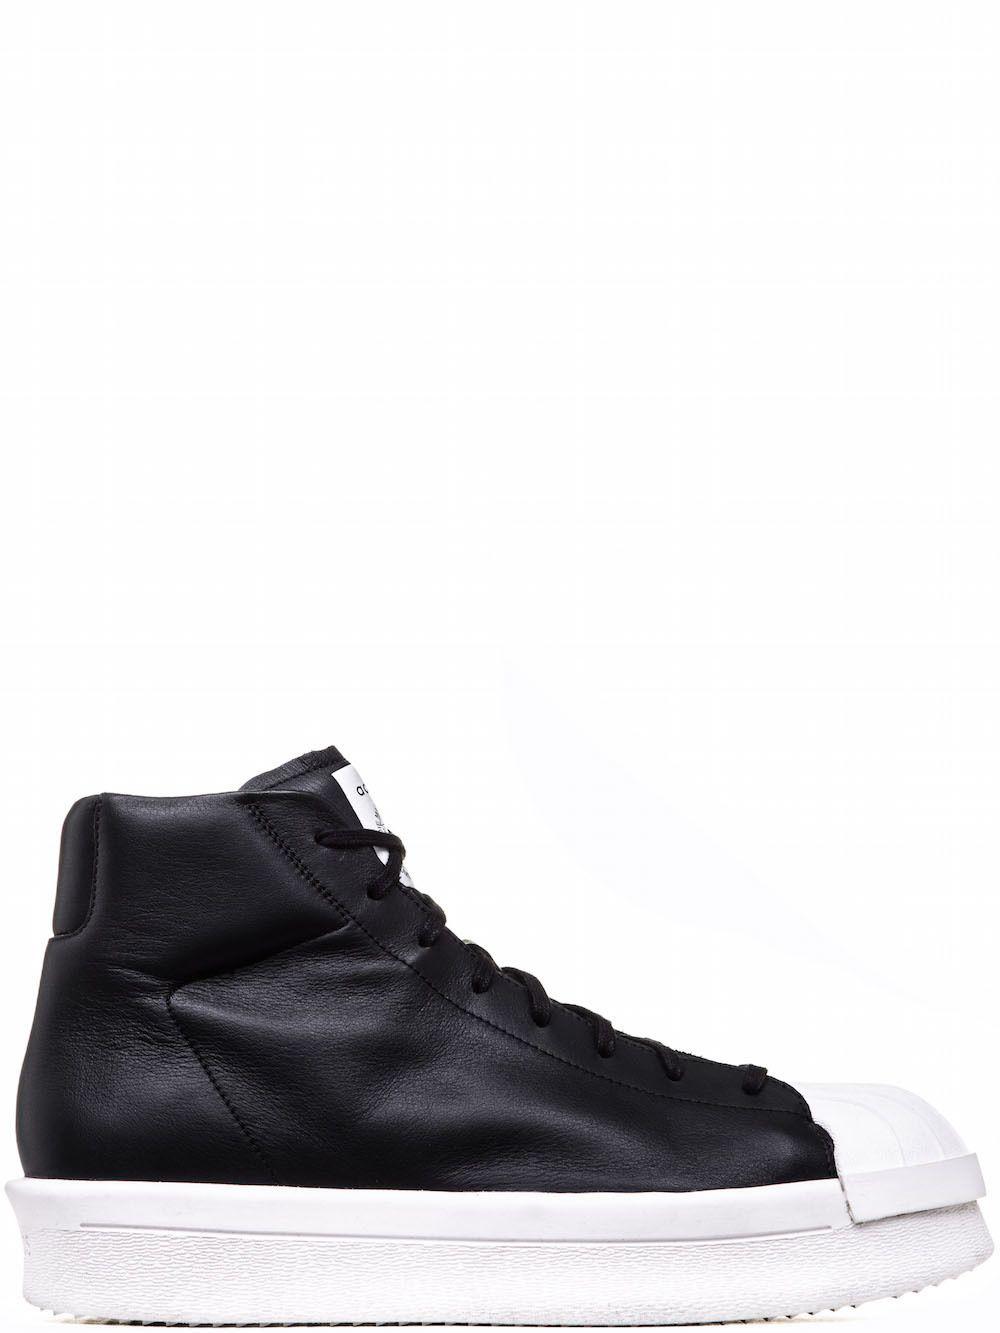 rick owens fw17 glitter adidas mastodonte basso scarpe in nero